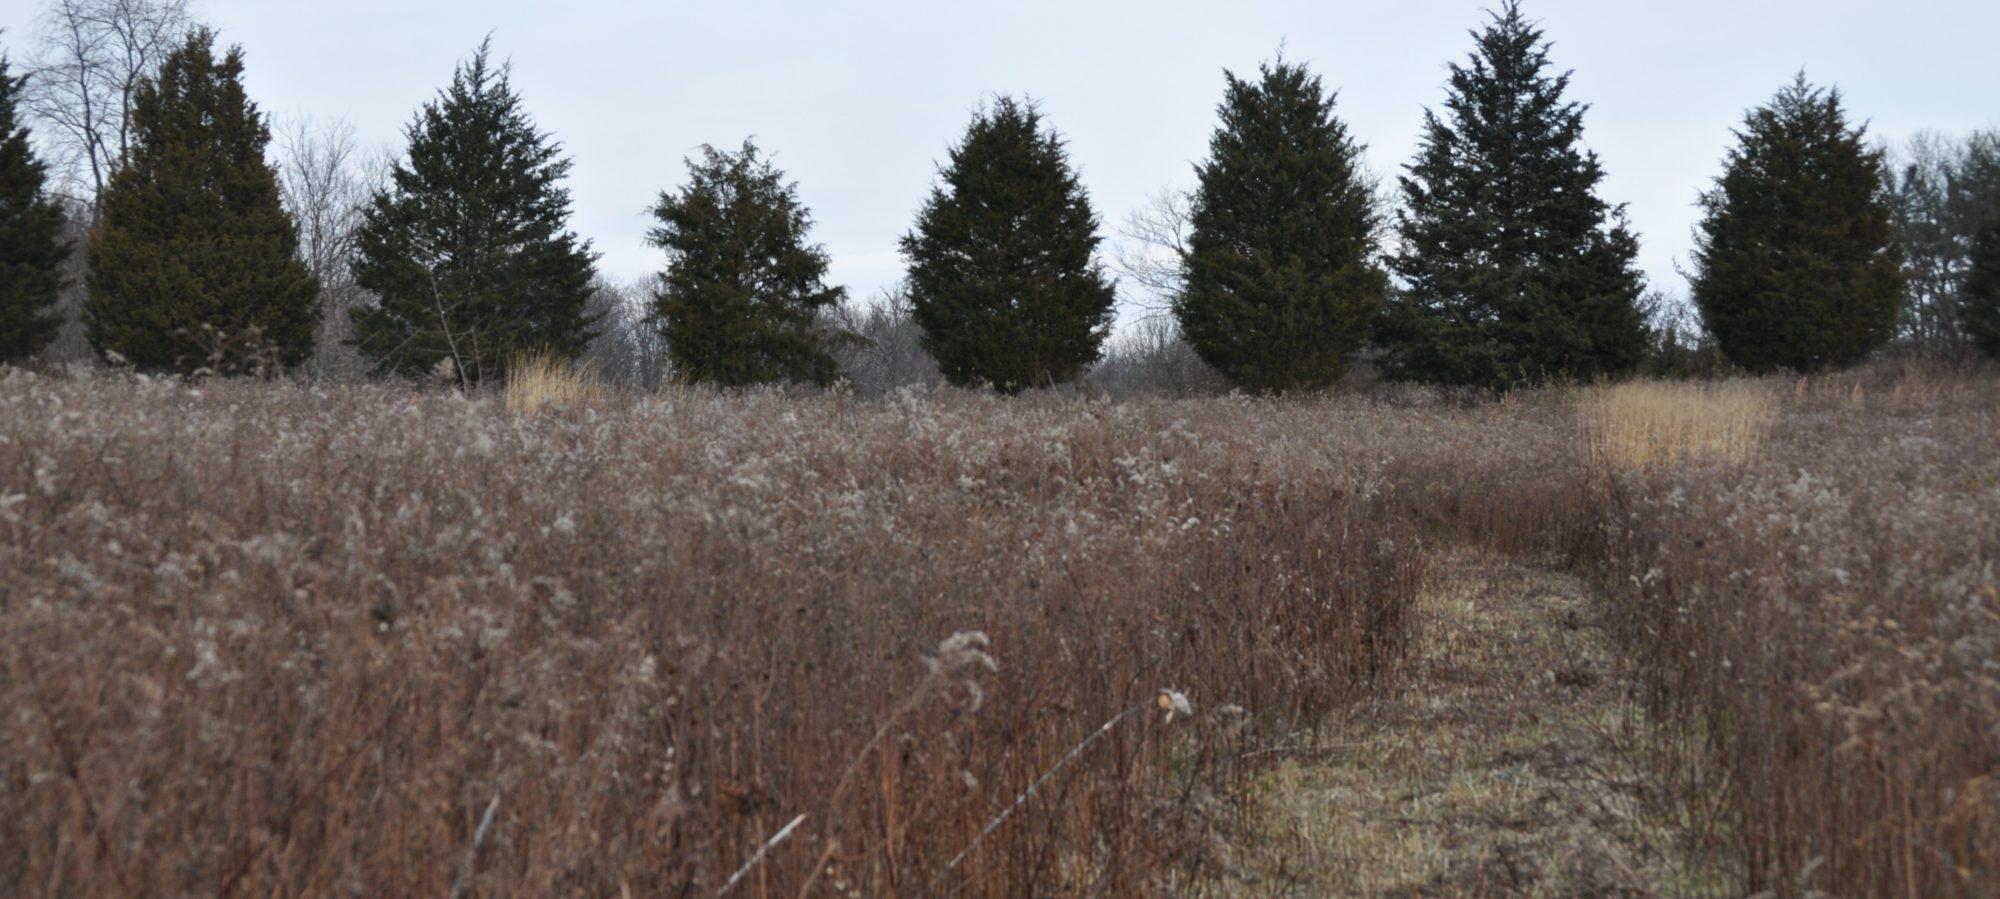 photo of trees in a winter field (c) Rev. Deb Vaughn